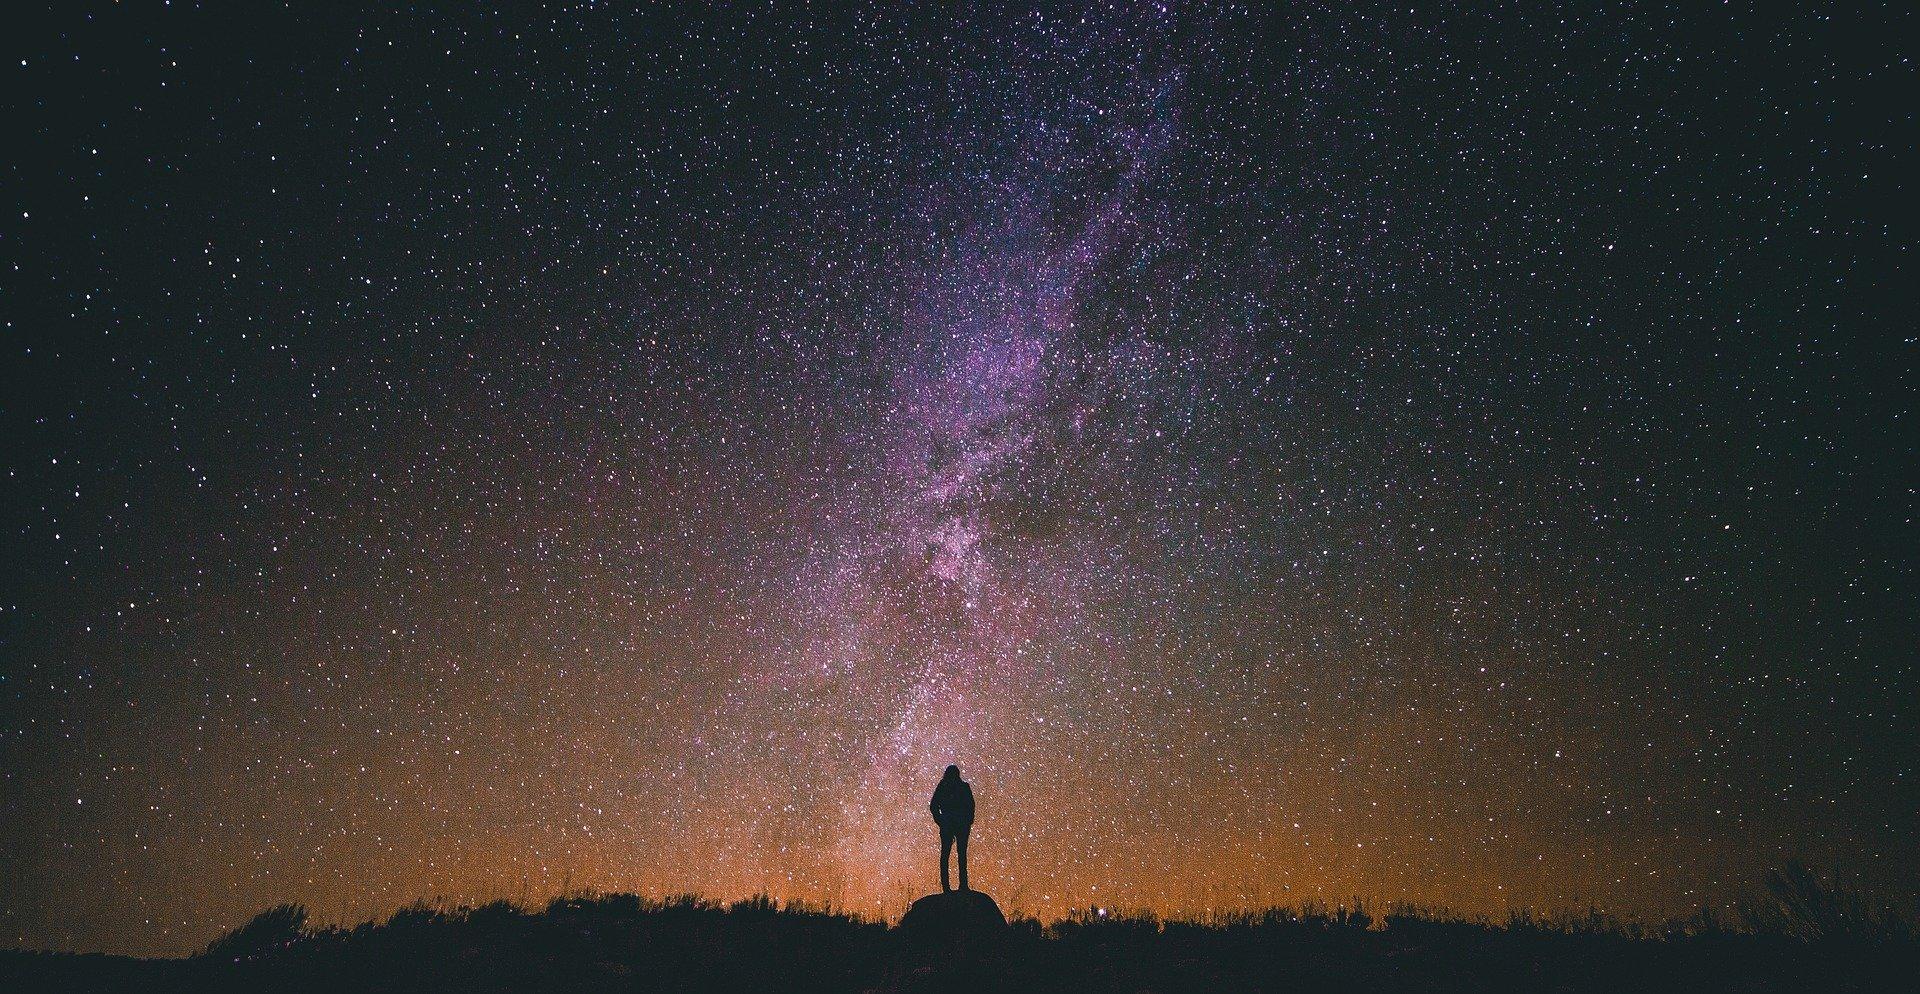 starry-night-1149815_1920